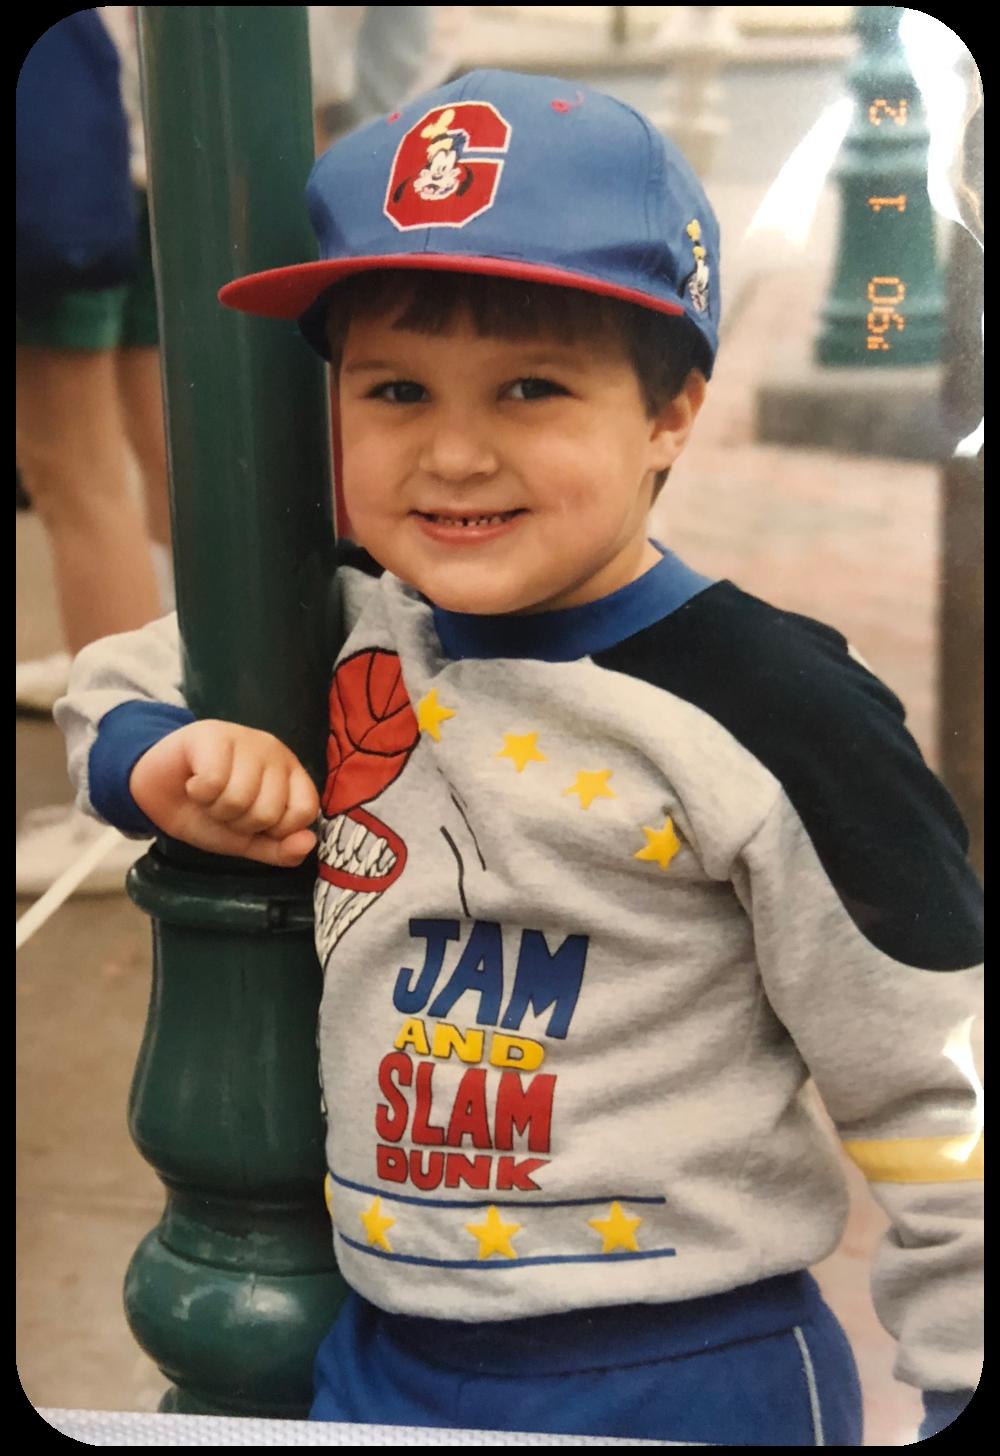 Chris, Age 4